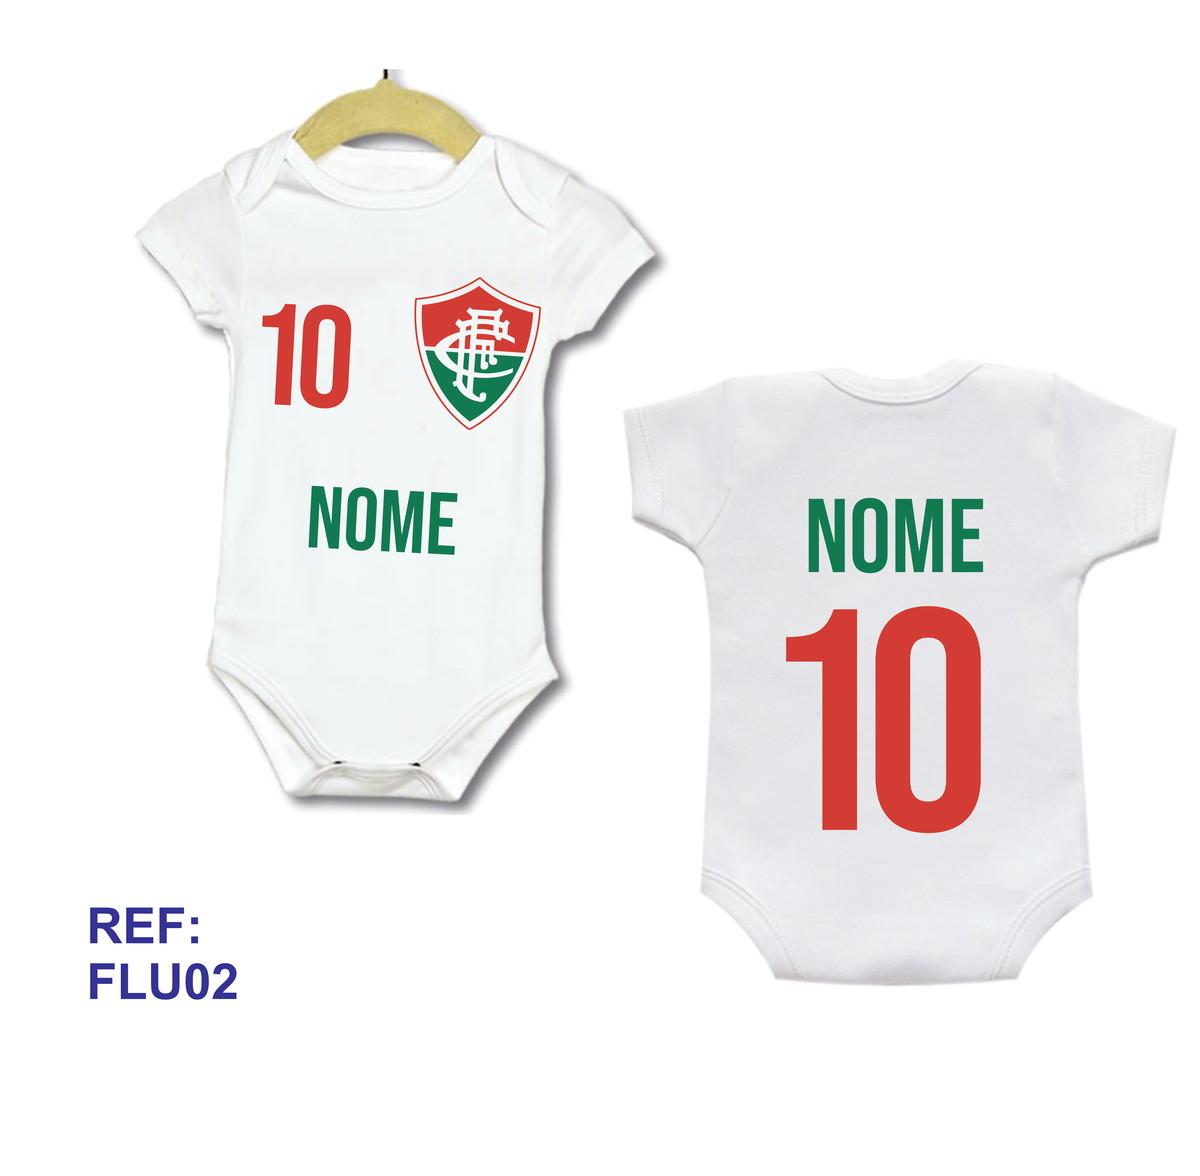 Body Bebe Infantil Personalizado Camisa Fluminense Com Nome no Elo7 ... c248c4dd7c1f2